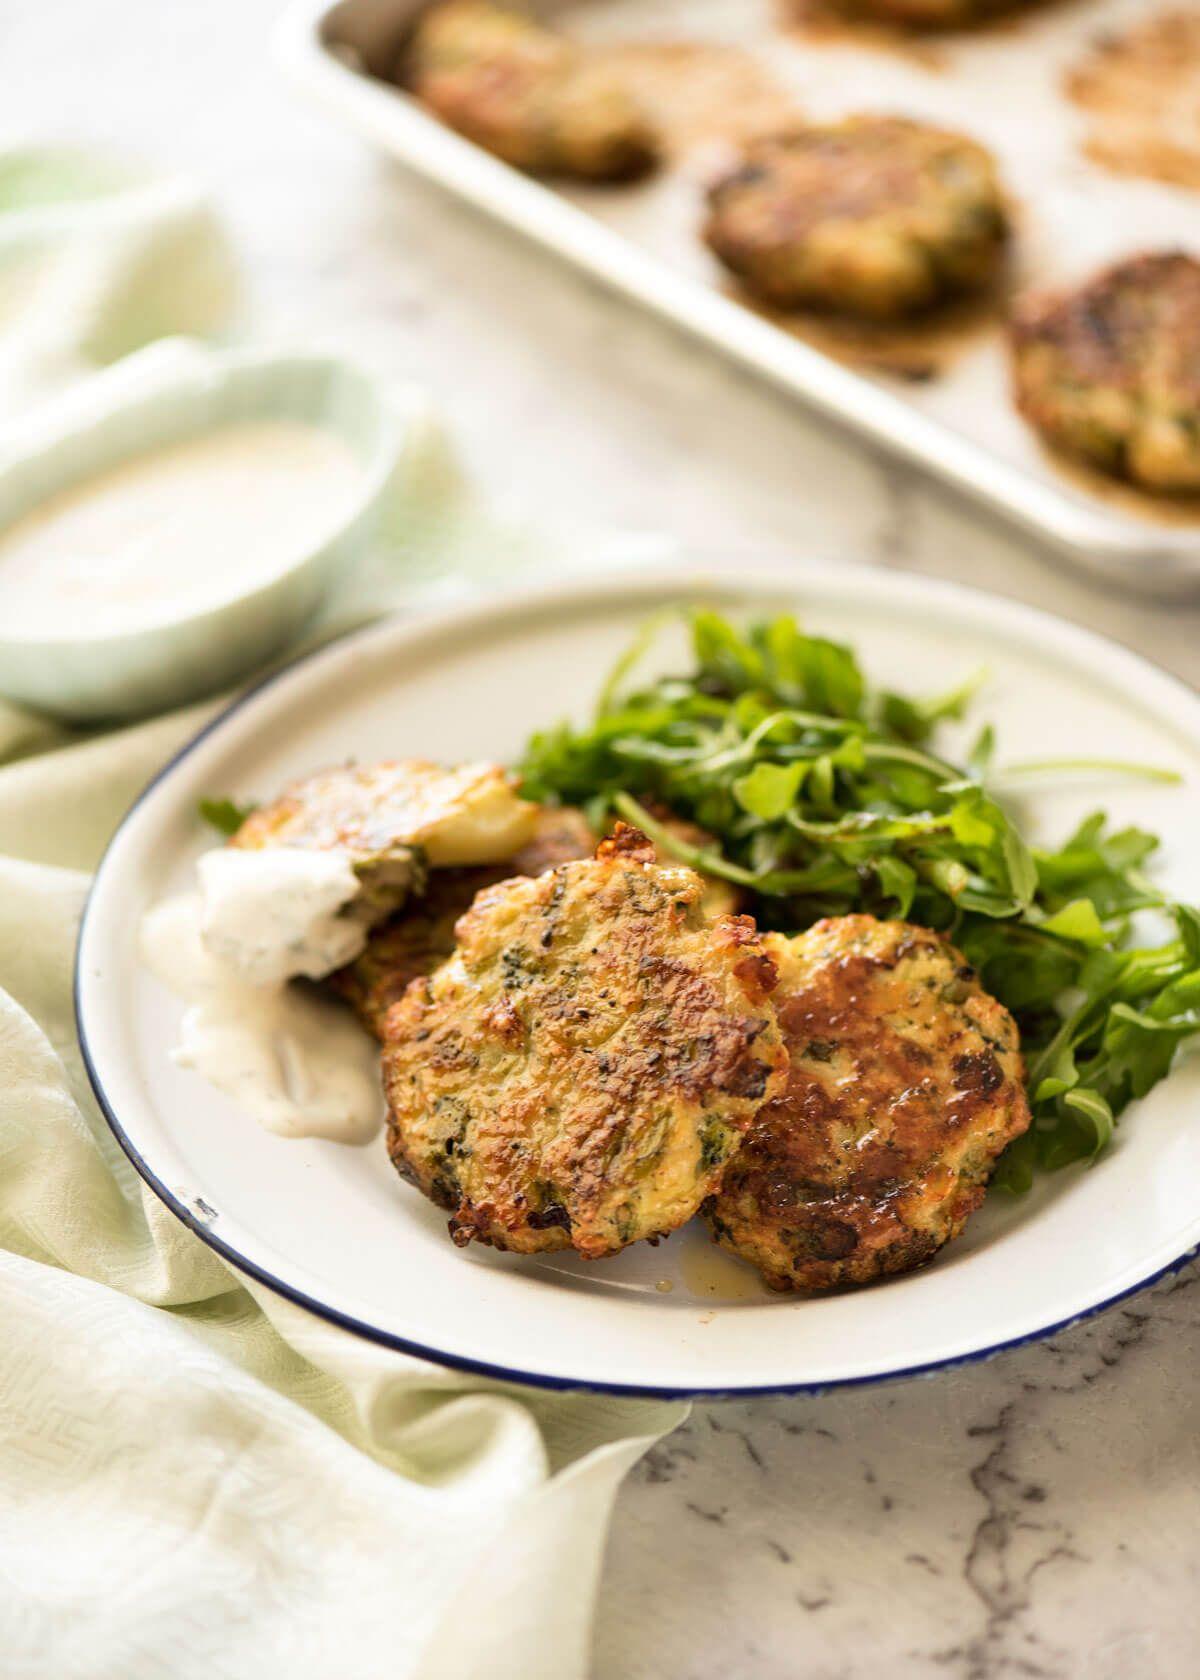 Beignet De Brocolis Au Four cheesy chicken fritters with broccoli